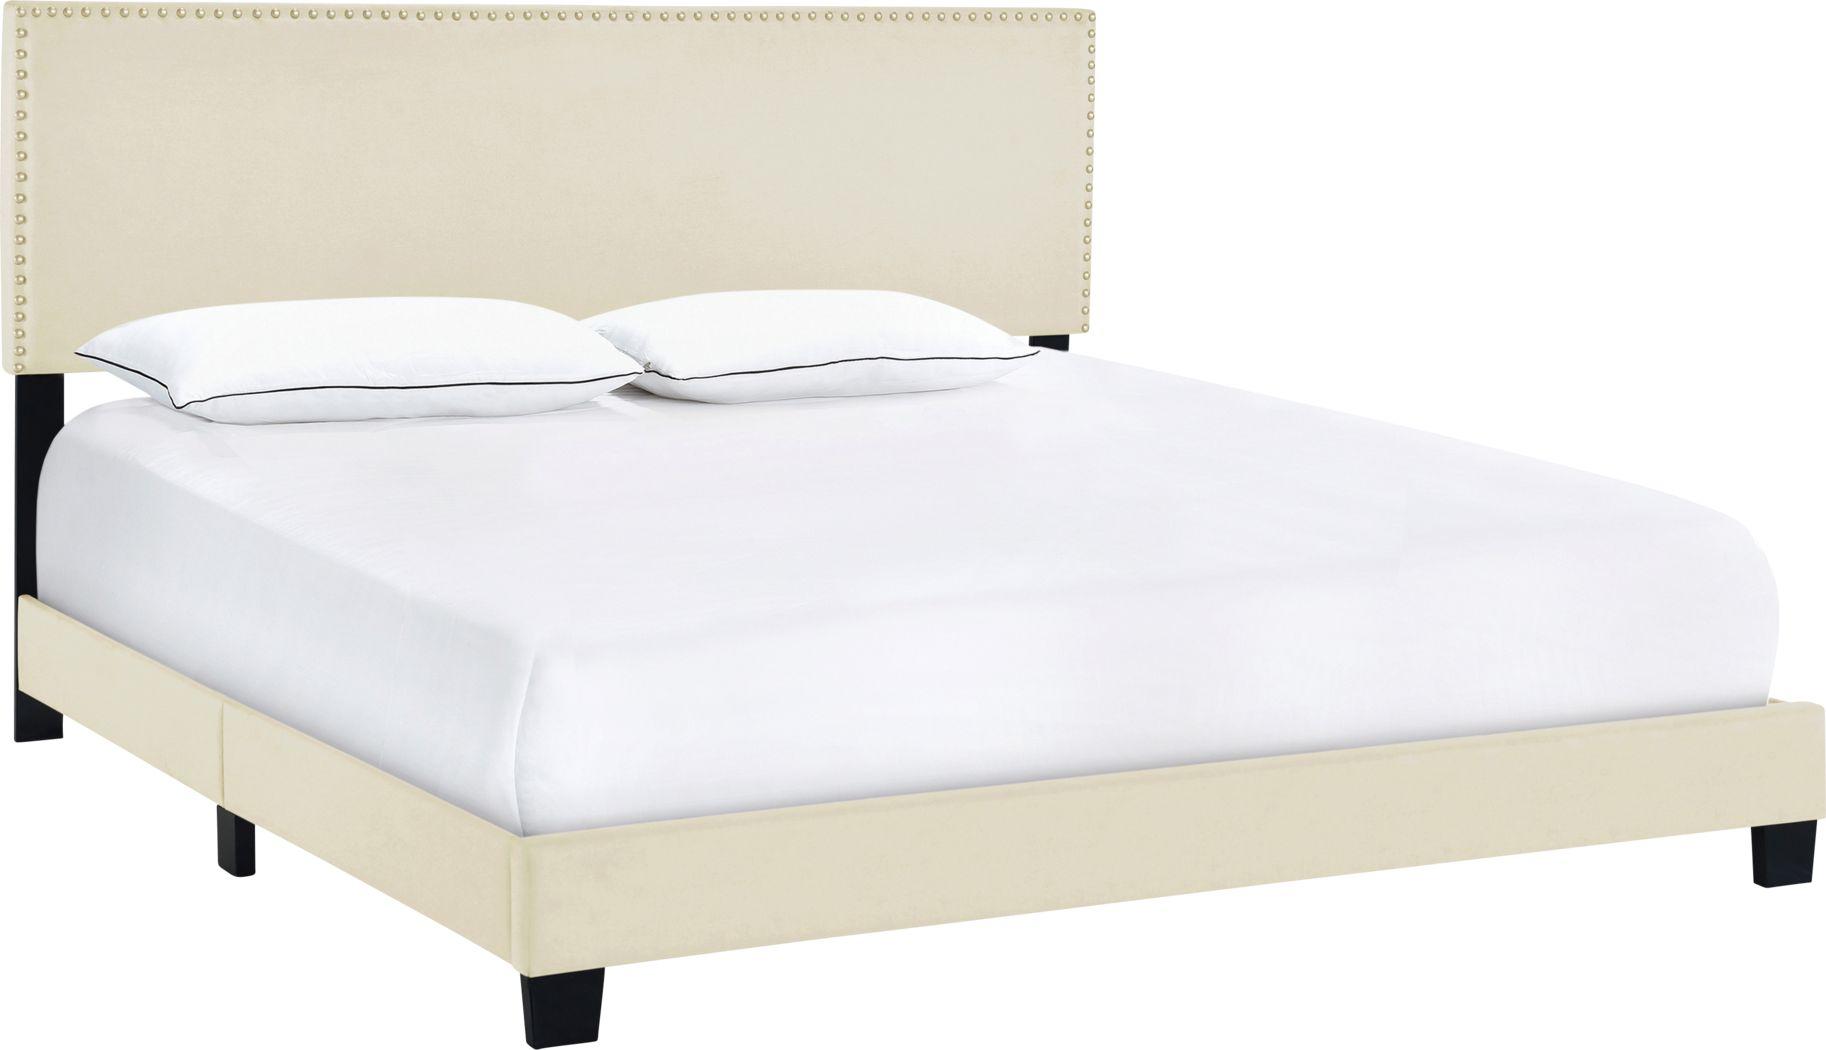 Kernite Beige King Bed